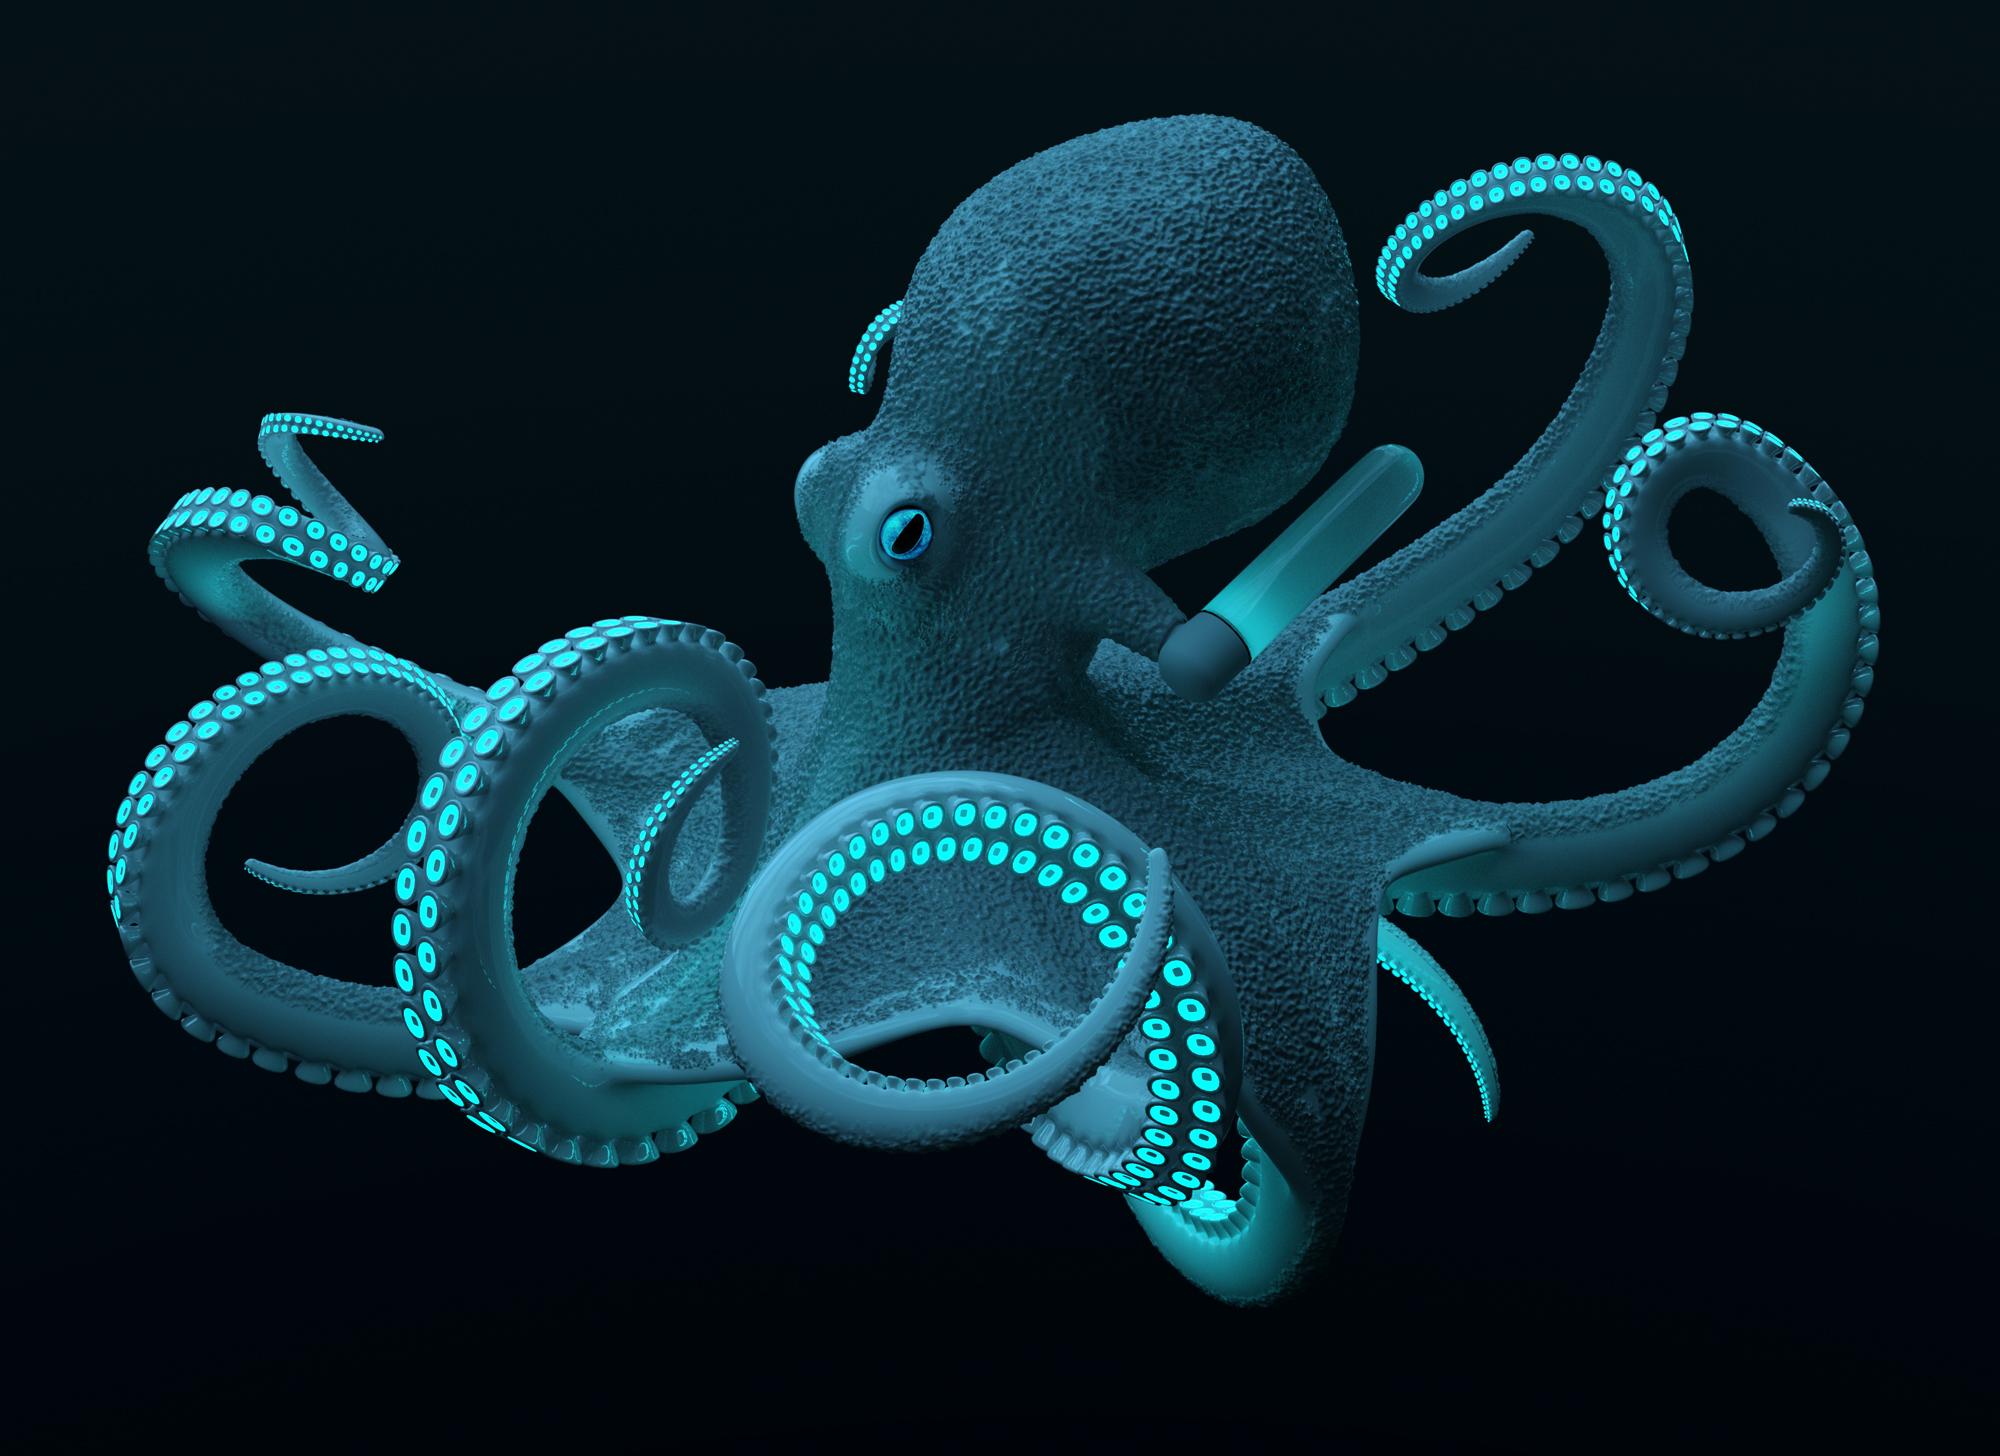 Deep-Sea-Animals-deep-sea-creatures-wallpaper-wp3004882